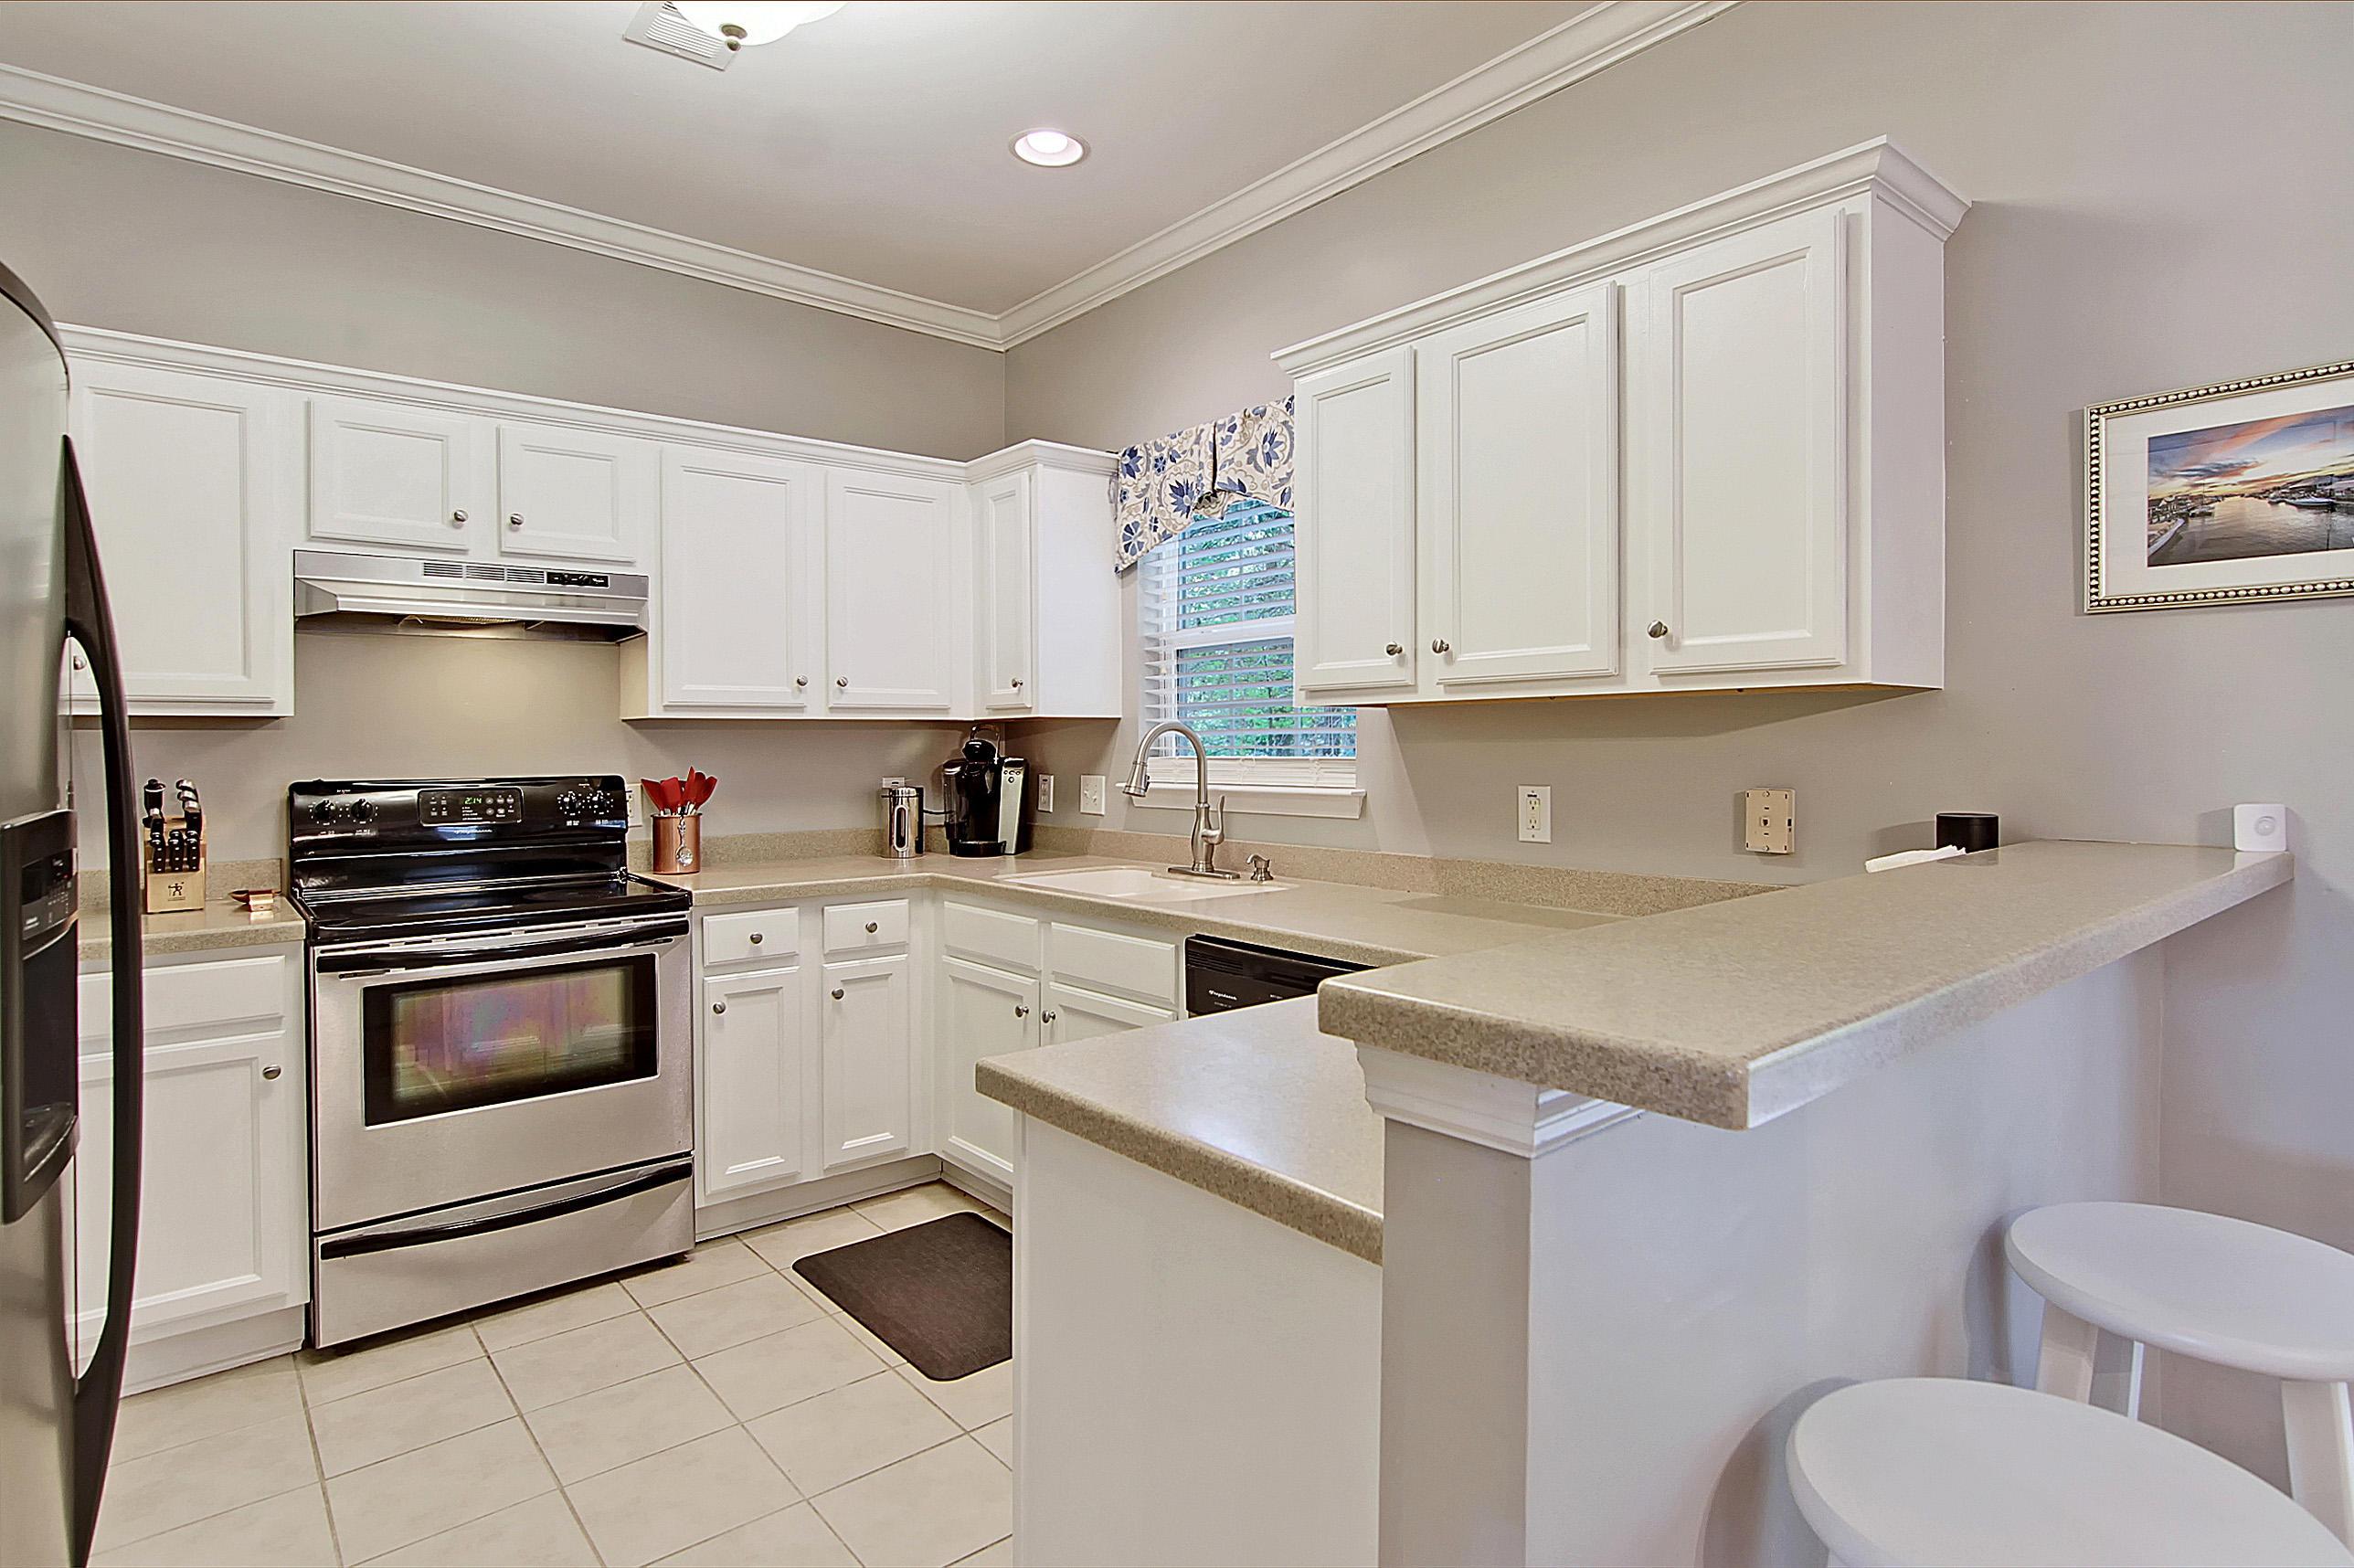 Laurel Grove Homes For Sale - 1423 Whispering Oak, Mount Pleasant, SC - 24